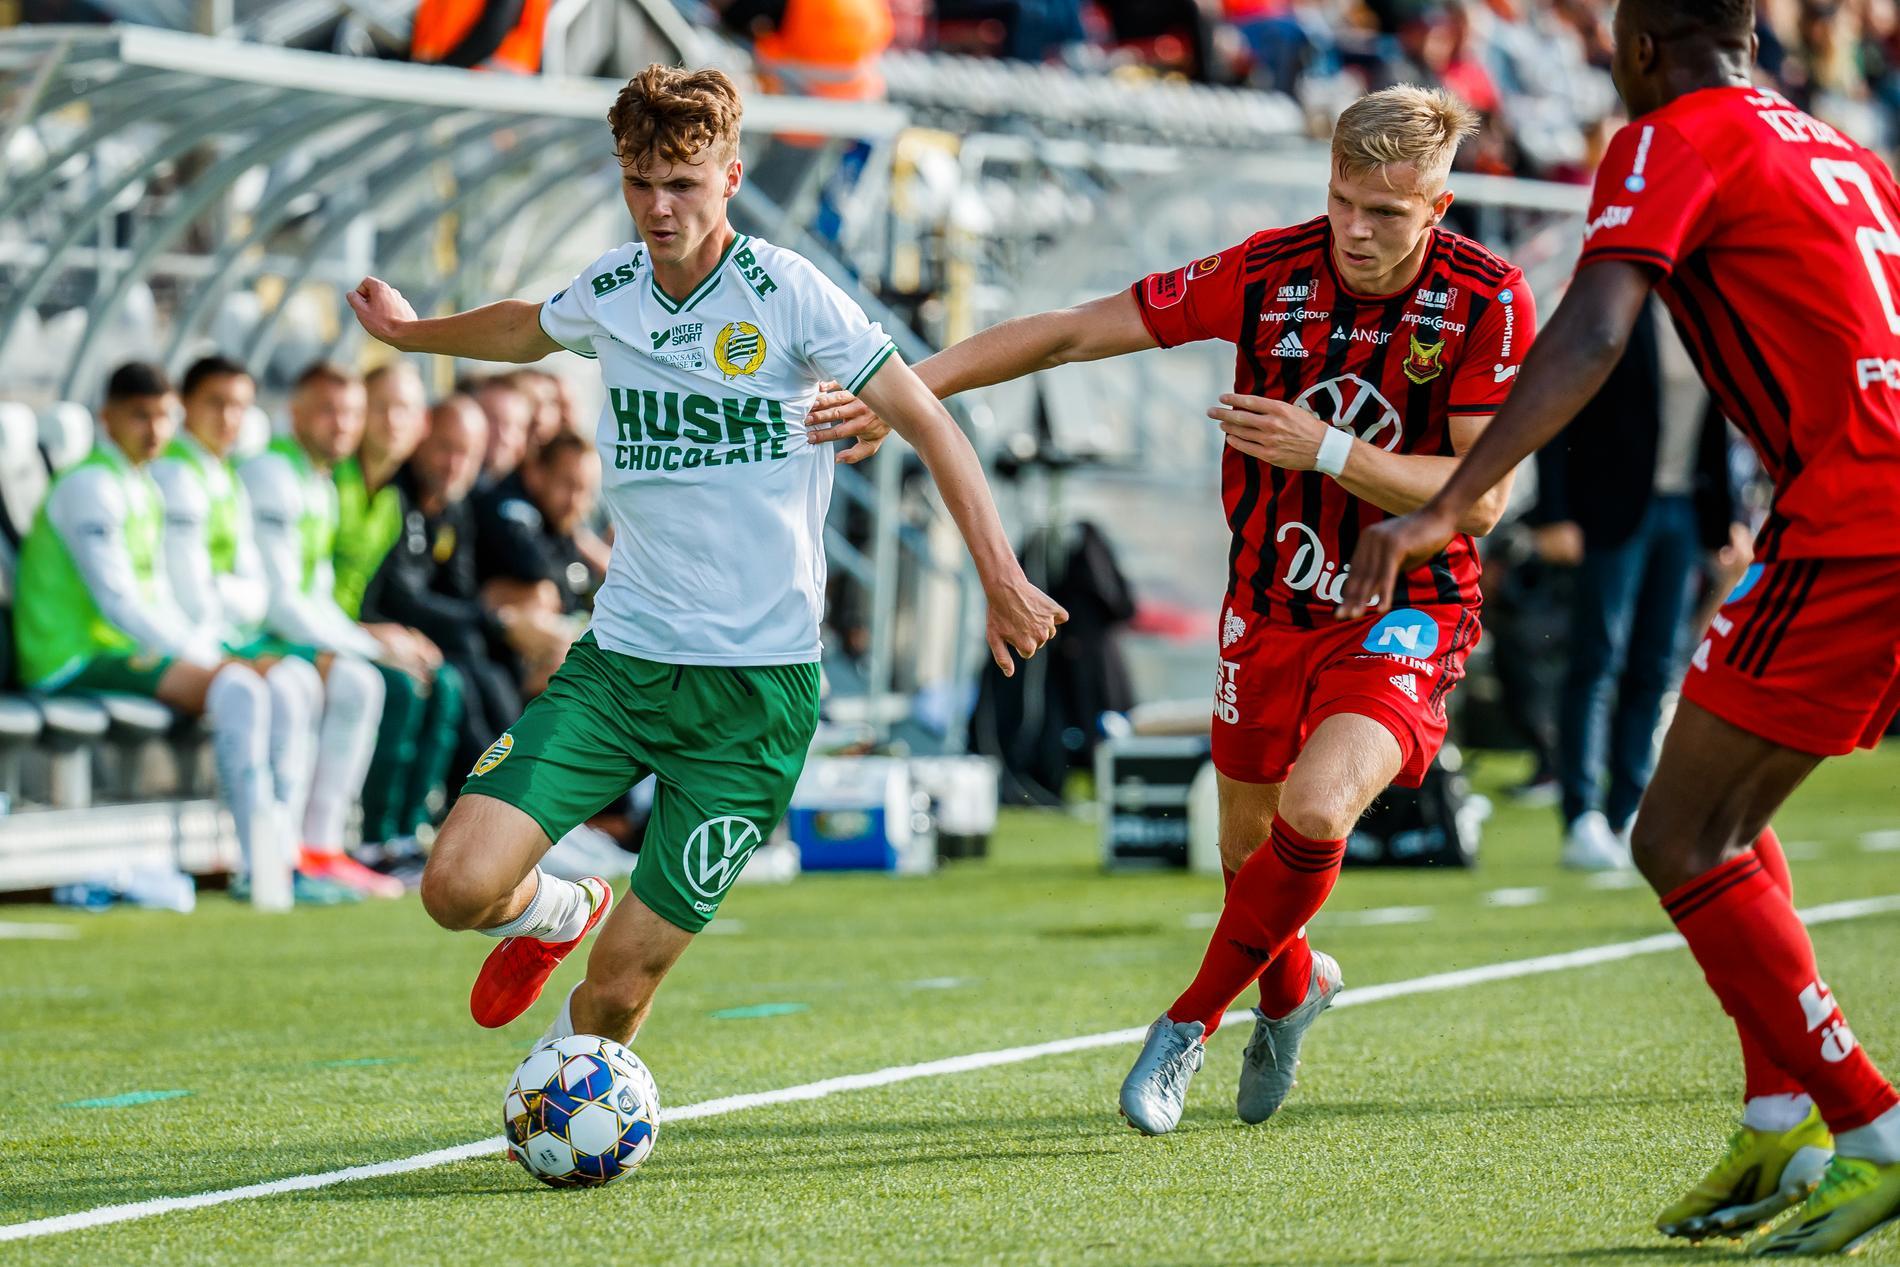 Williot Swedberg startade mot Östersund.